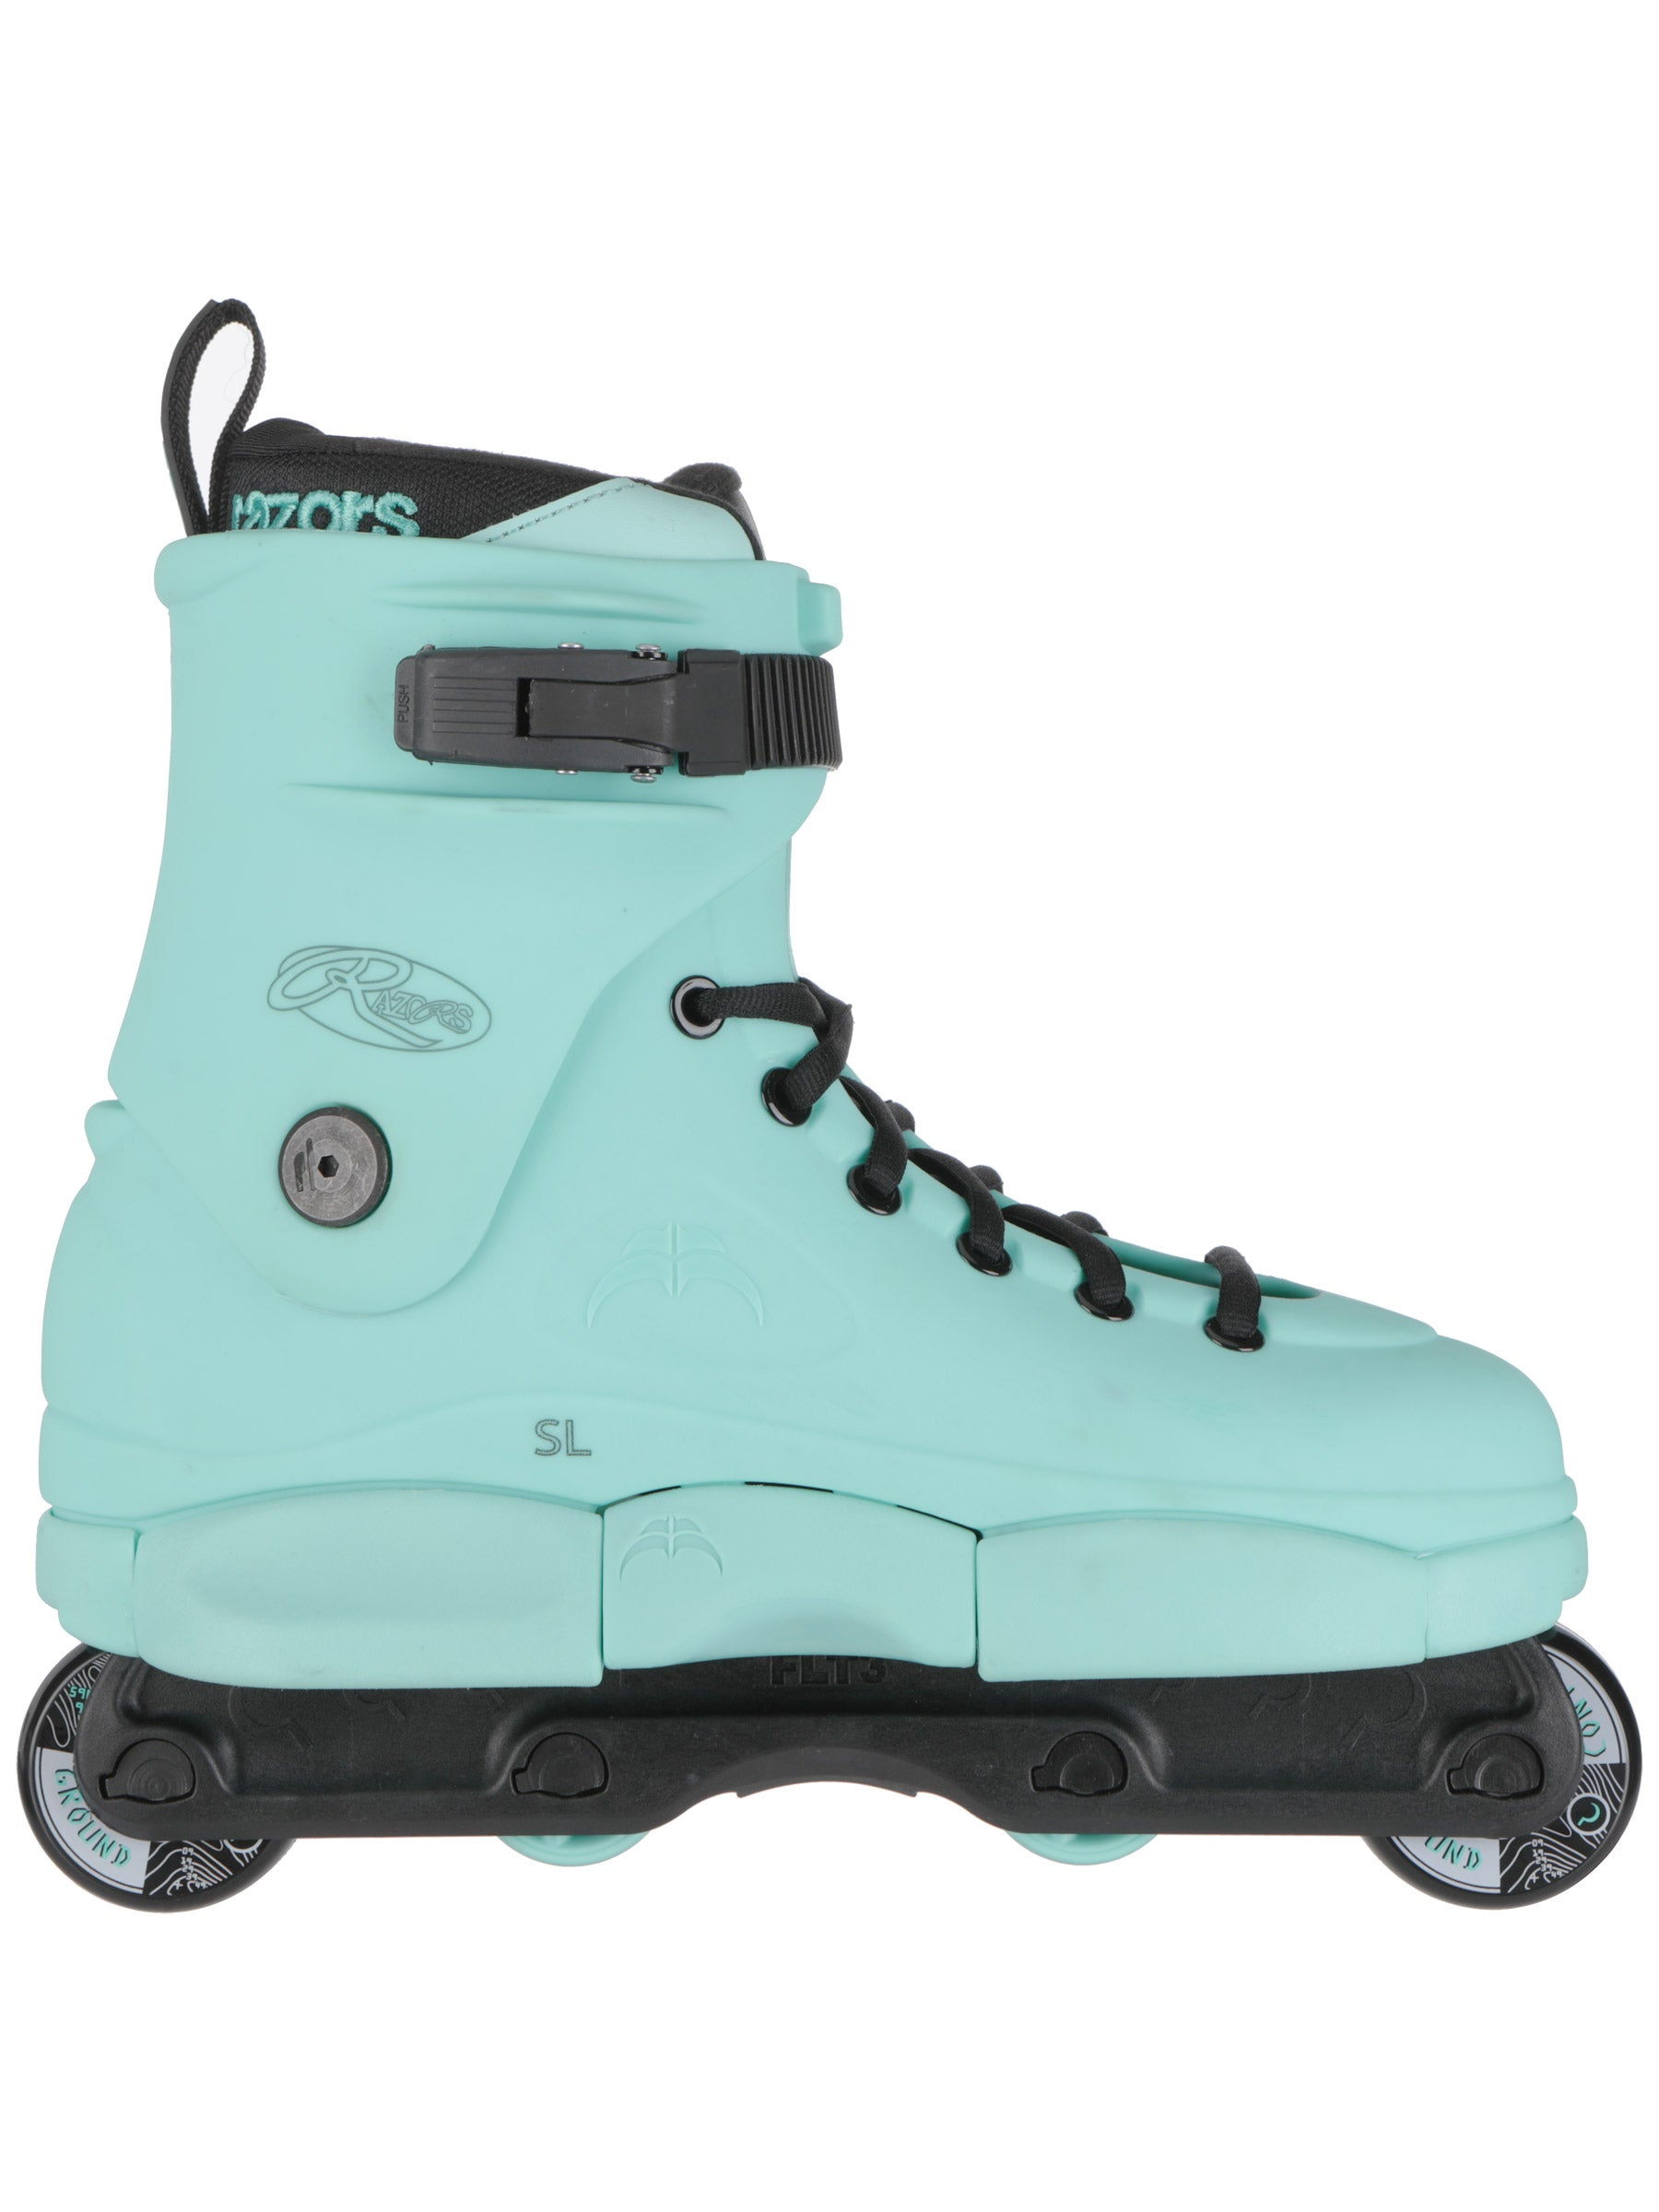 Inlineskating-Artikel Razors SL Mint Aggressive Skates